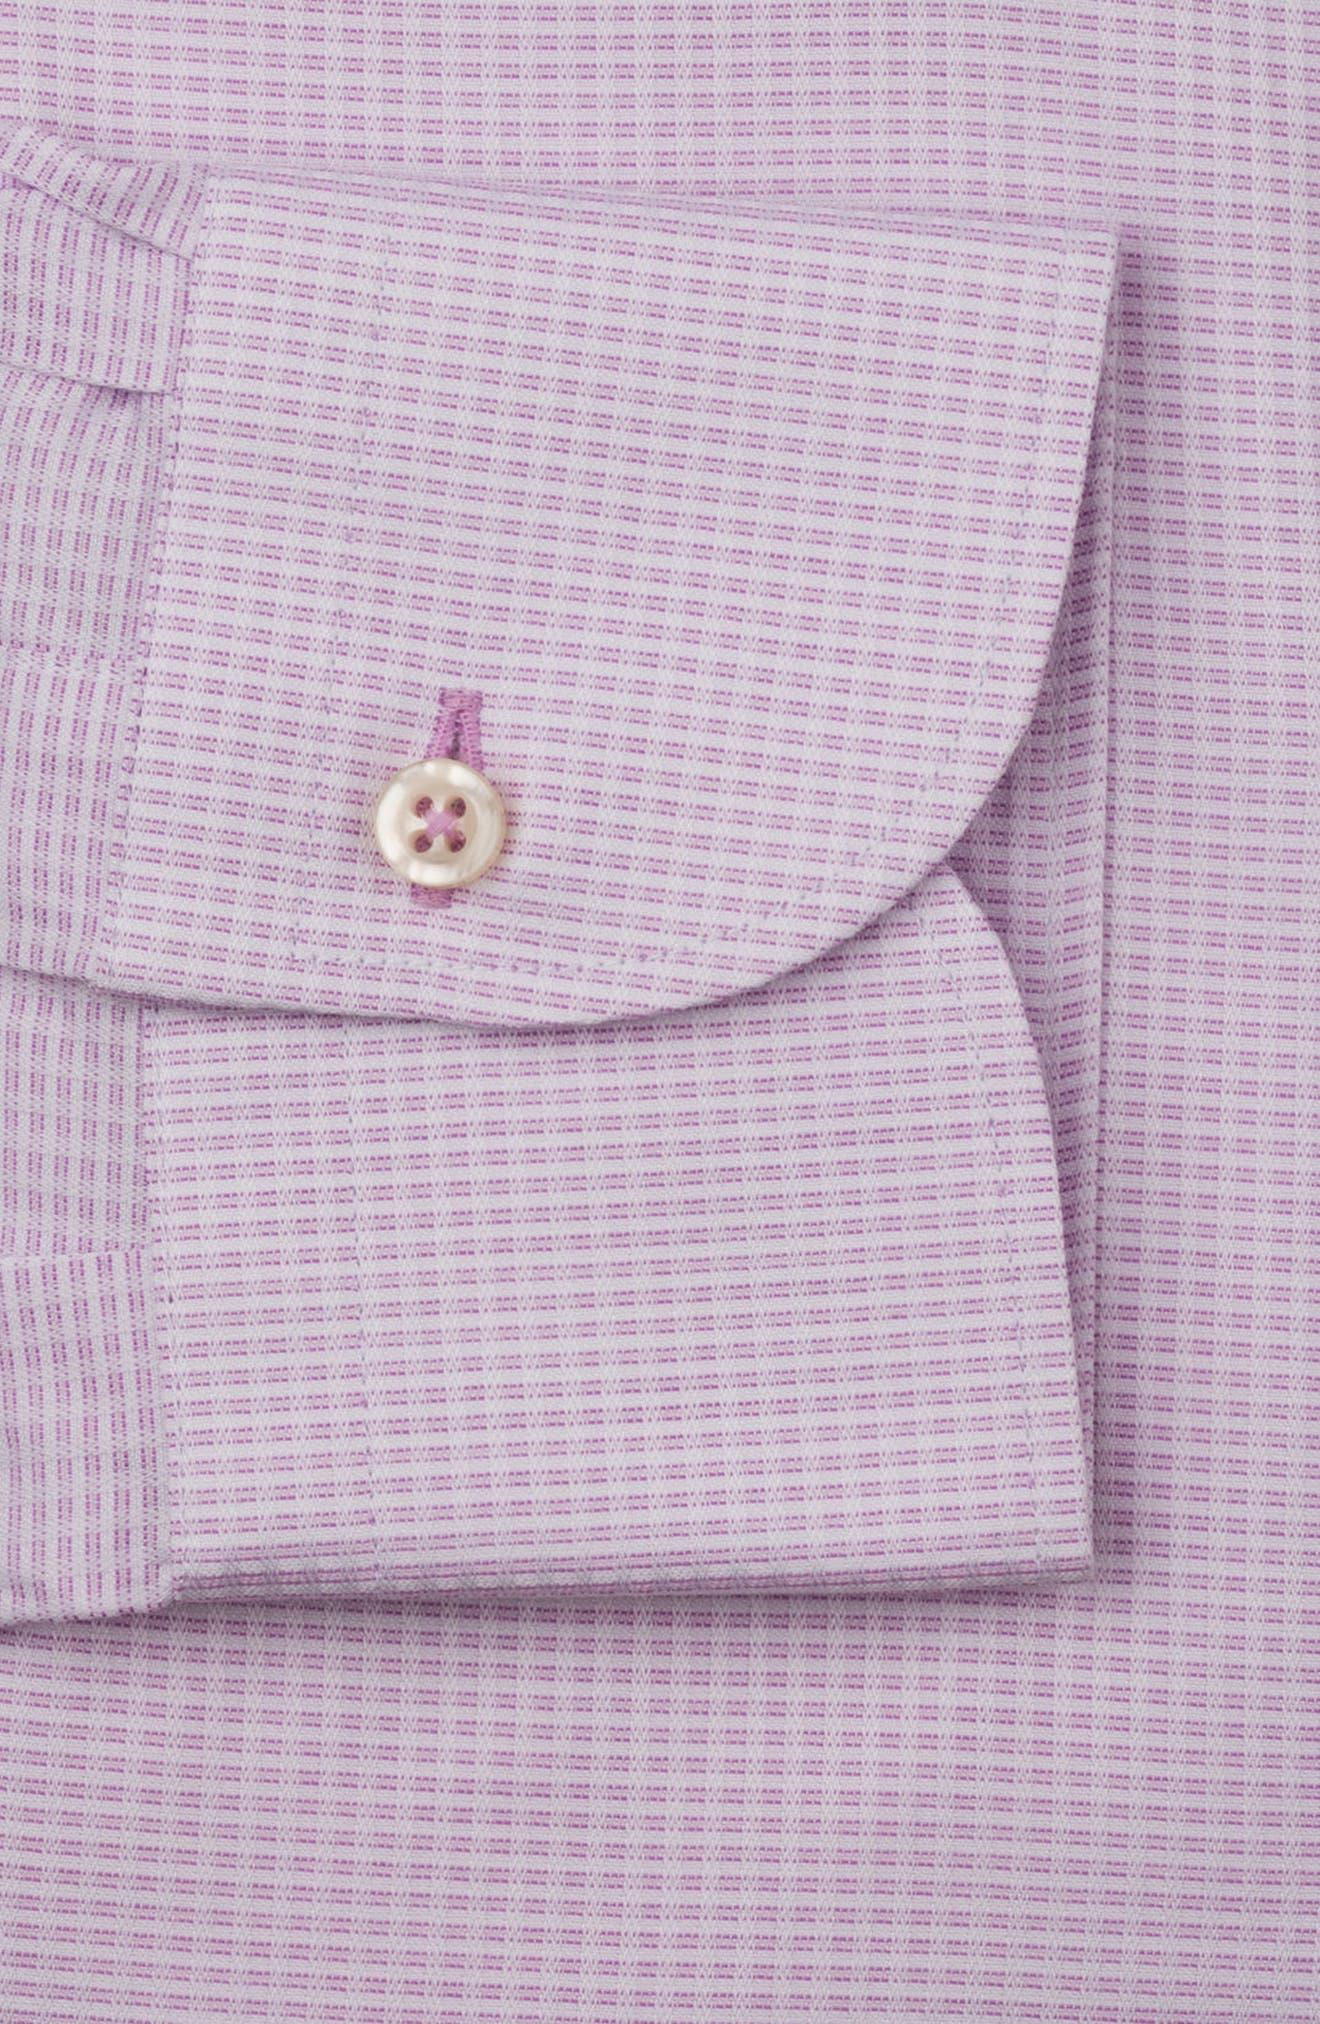 Regular Fit Solid Dress Shirt,                             Alternate thumbnail 6, color,                             PINK